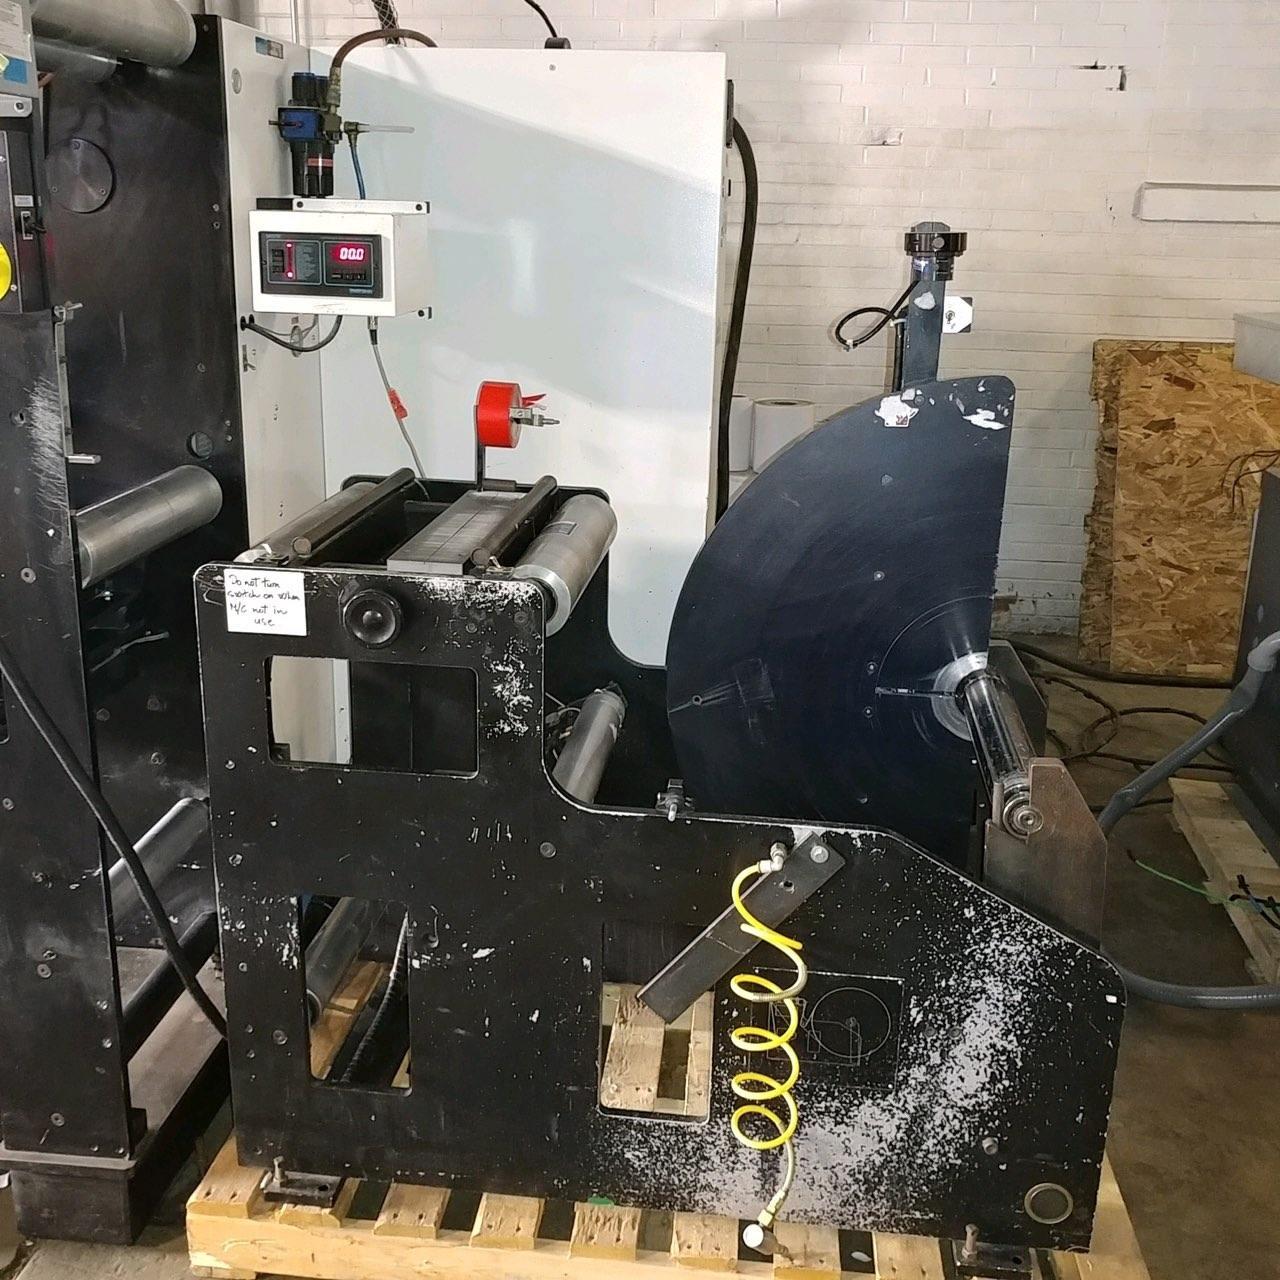 Rotoflex VLI400 - Used Flexo Printing Presses and Used Flexographic Equipment-1